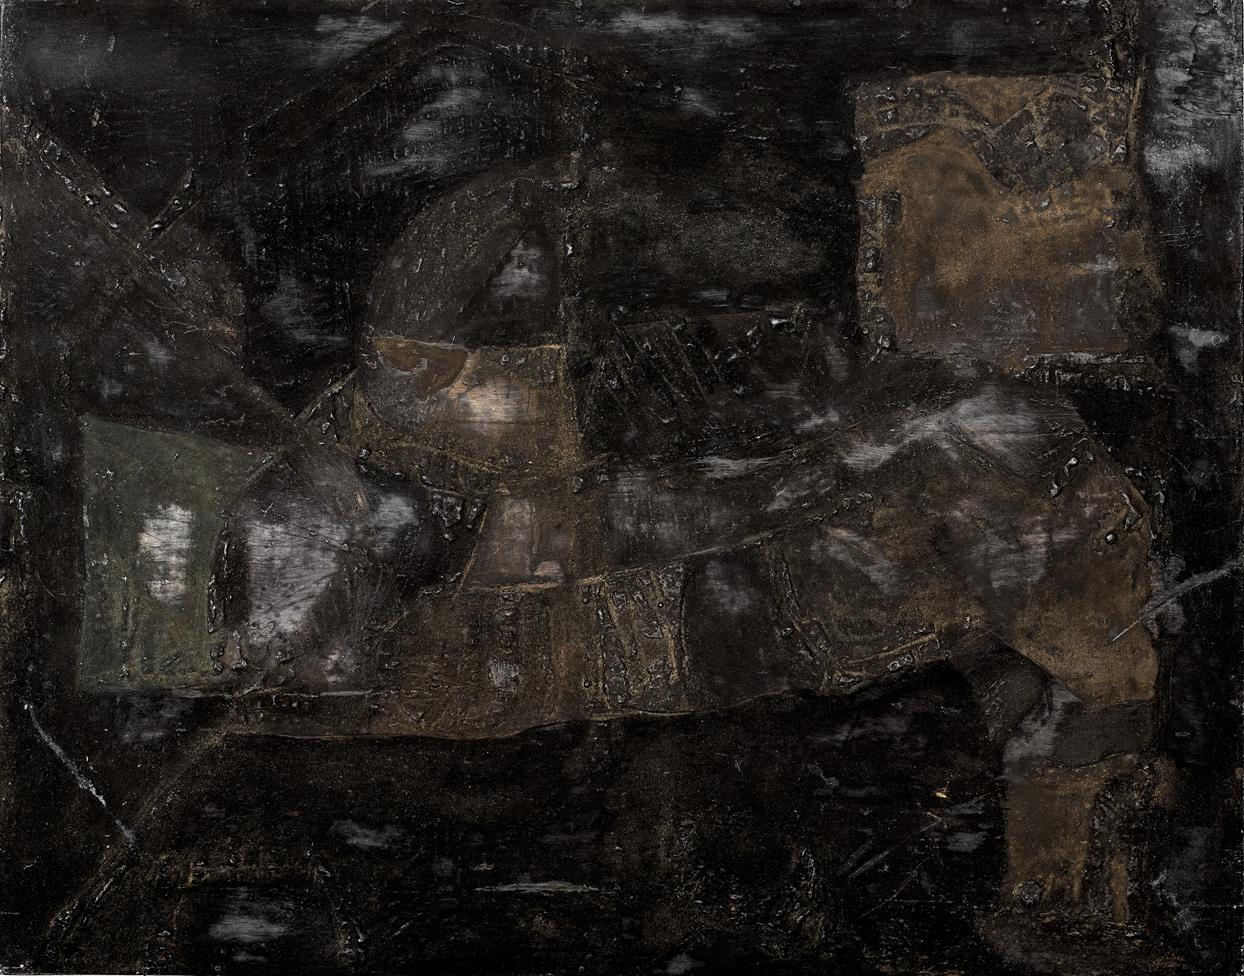 Sin título (1958) - Lucio Muñoz